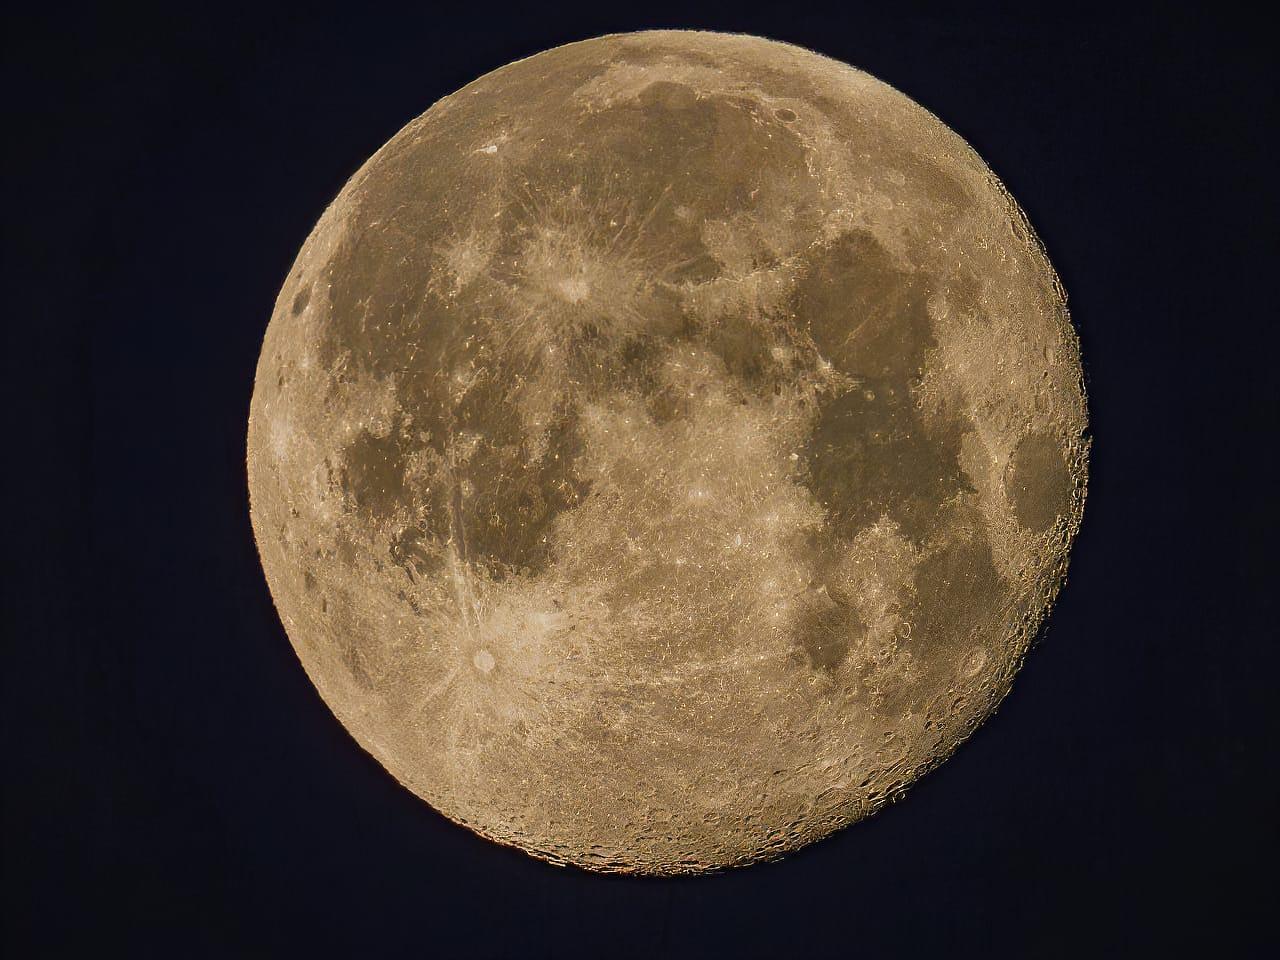 P1000 Lunar Photography 2500mm Jeff Wendorff